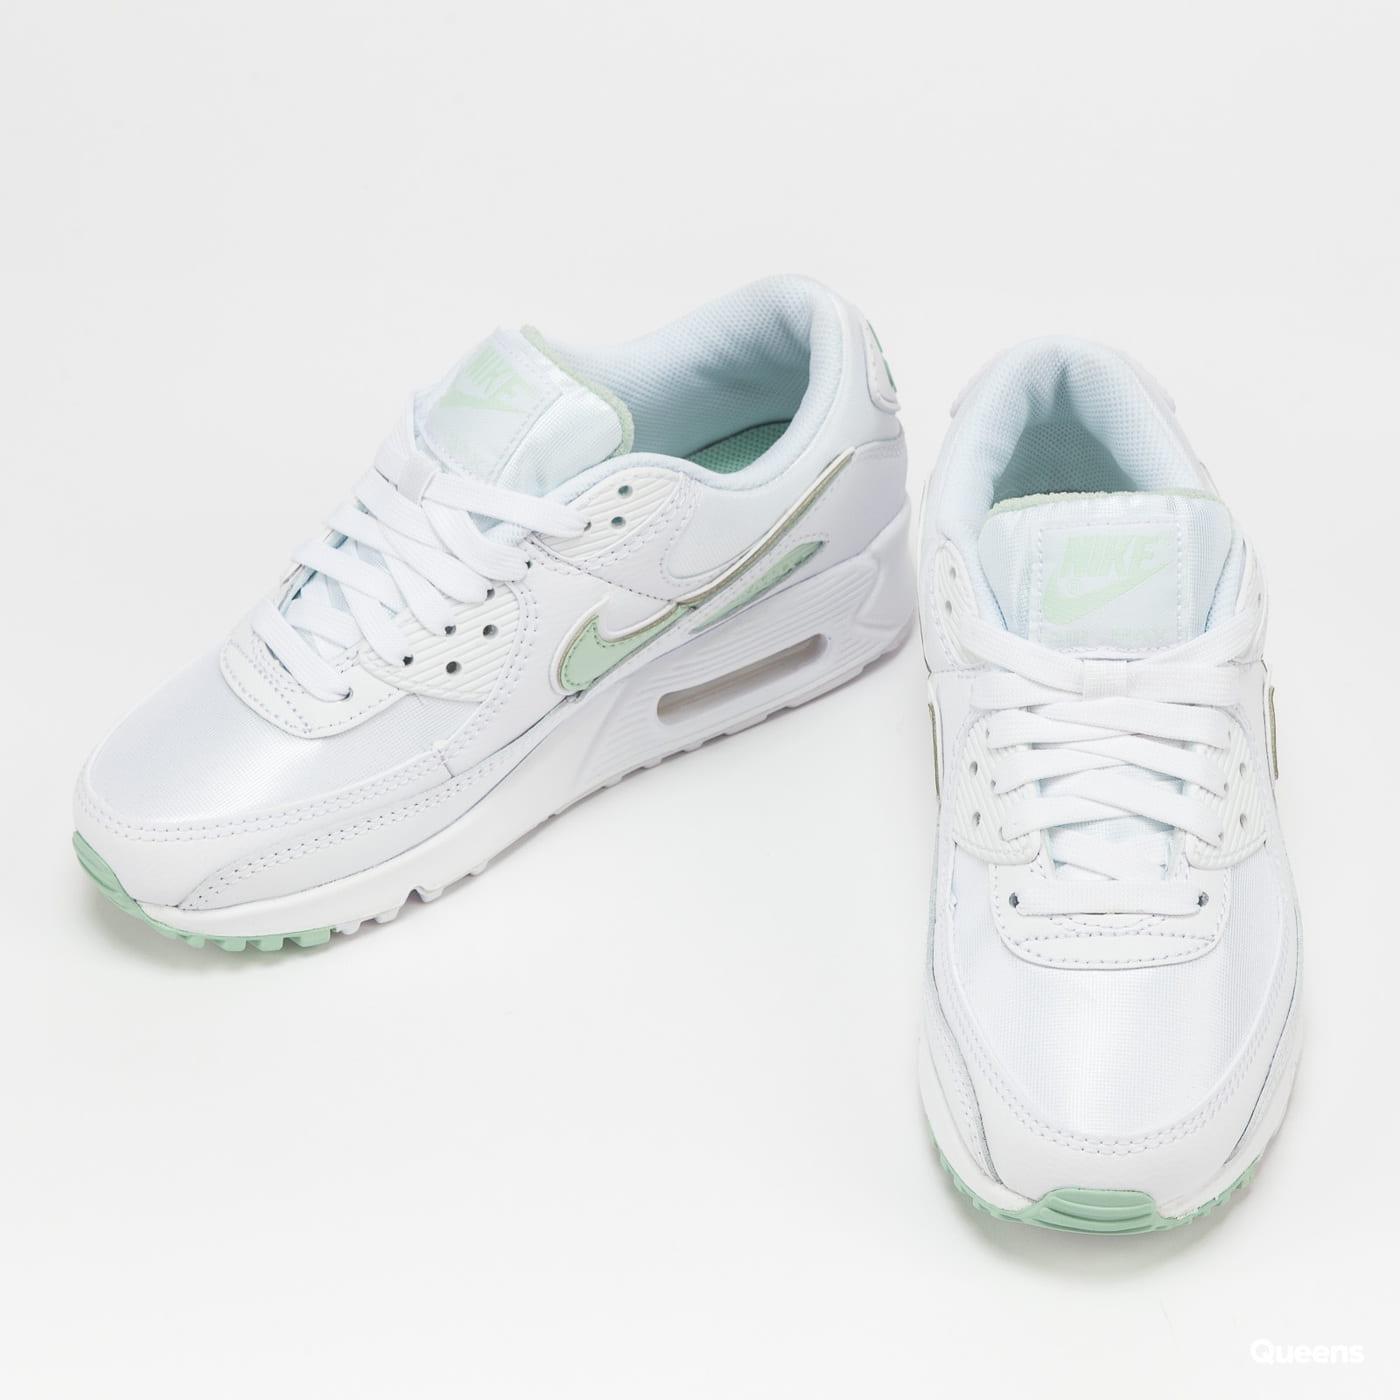 Nike W Air Max 90 white / pistachio frost